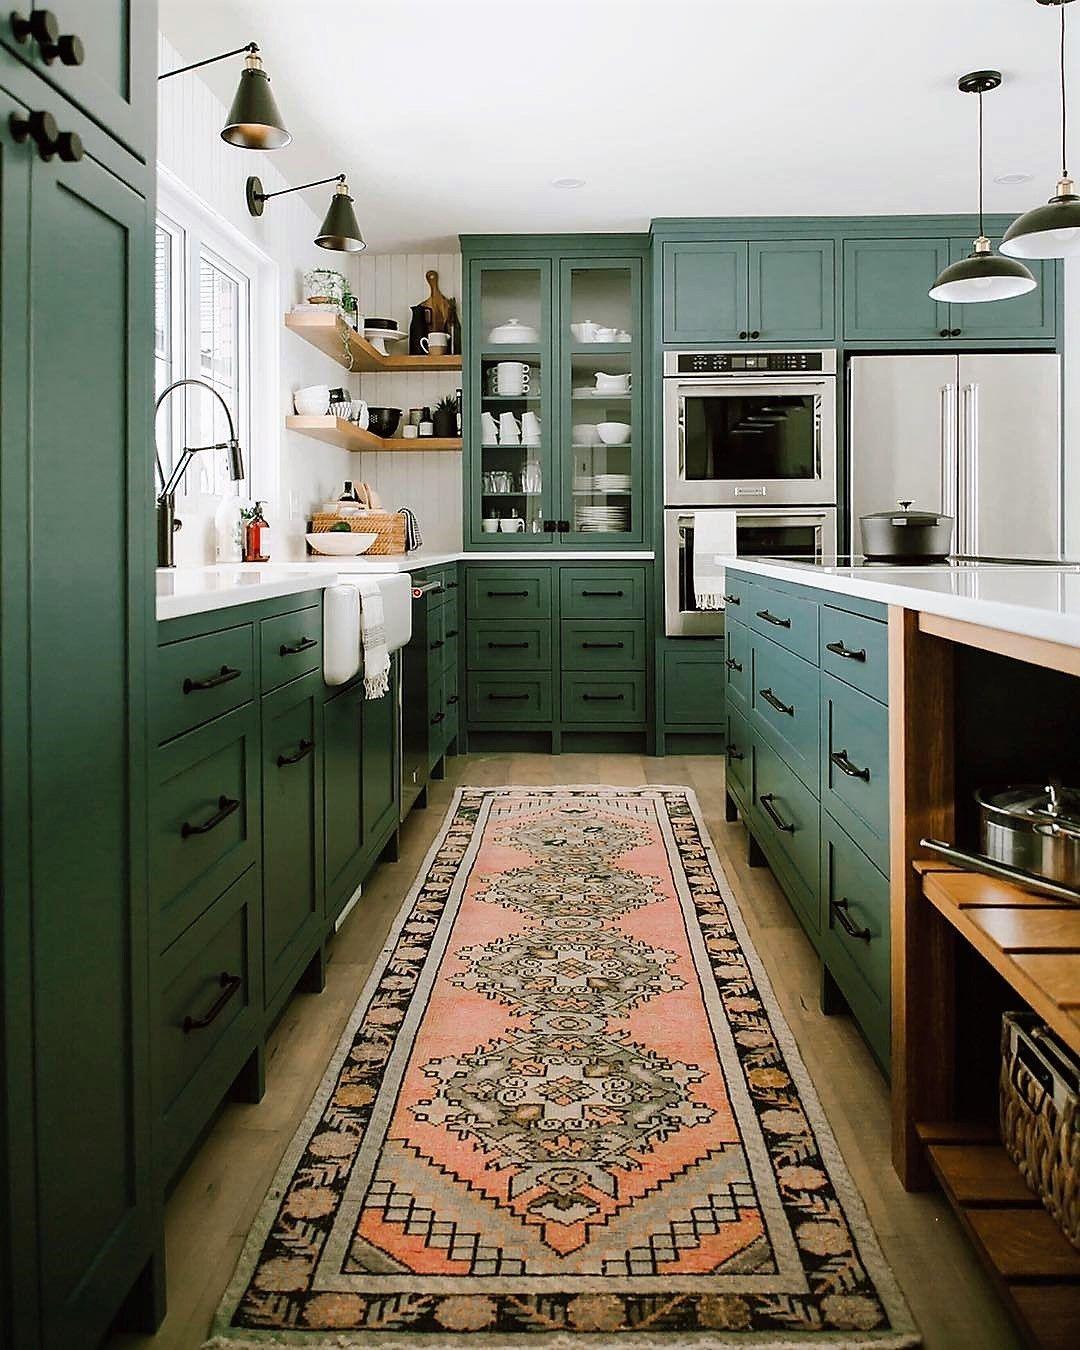 evergreen kitchen kitchen kitchens kitchenideas kitcheninspiration home decor kitchen on kitchen interior green id=14427